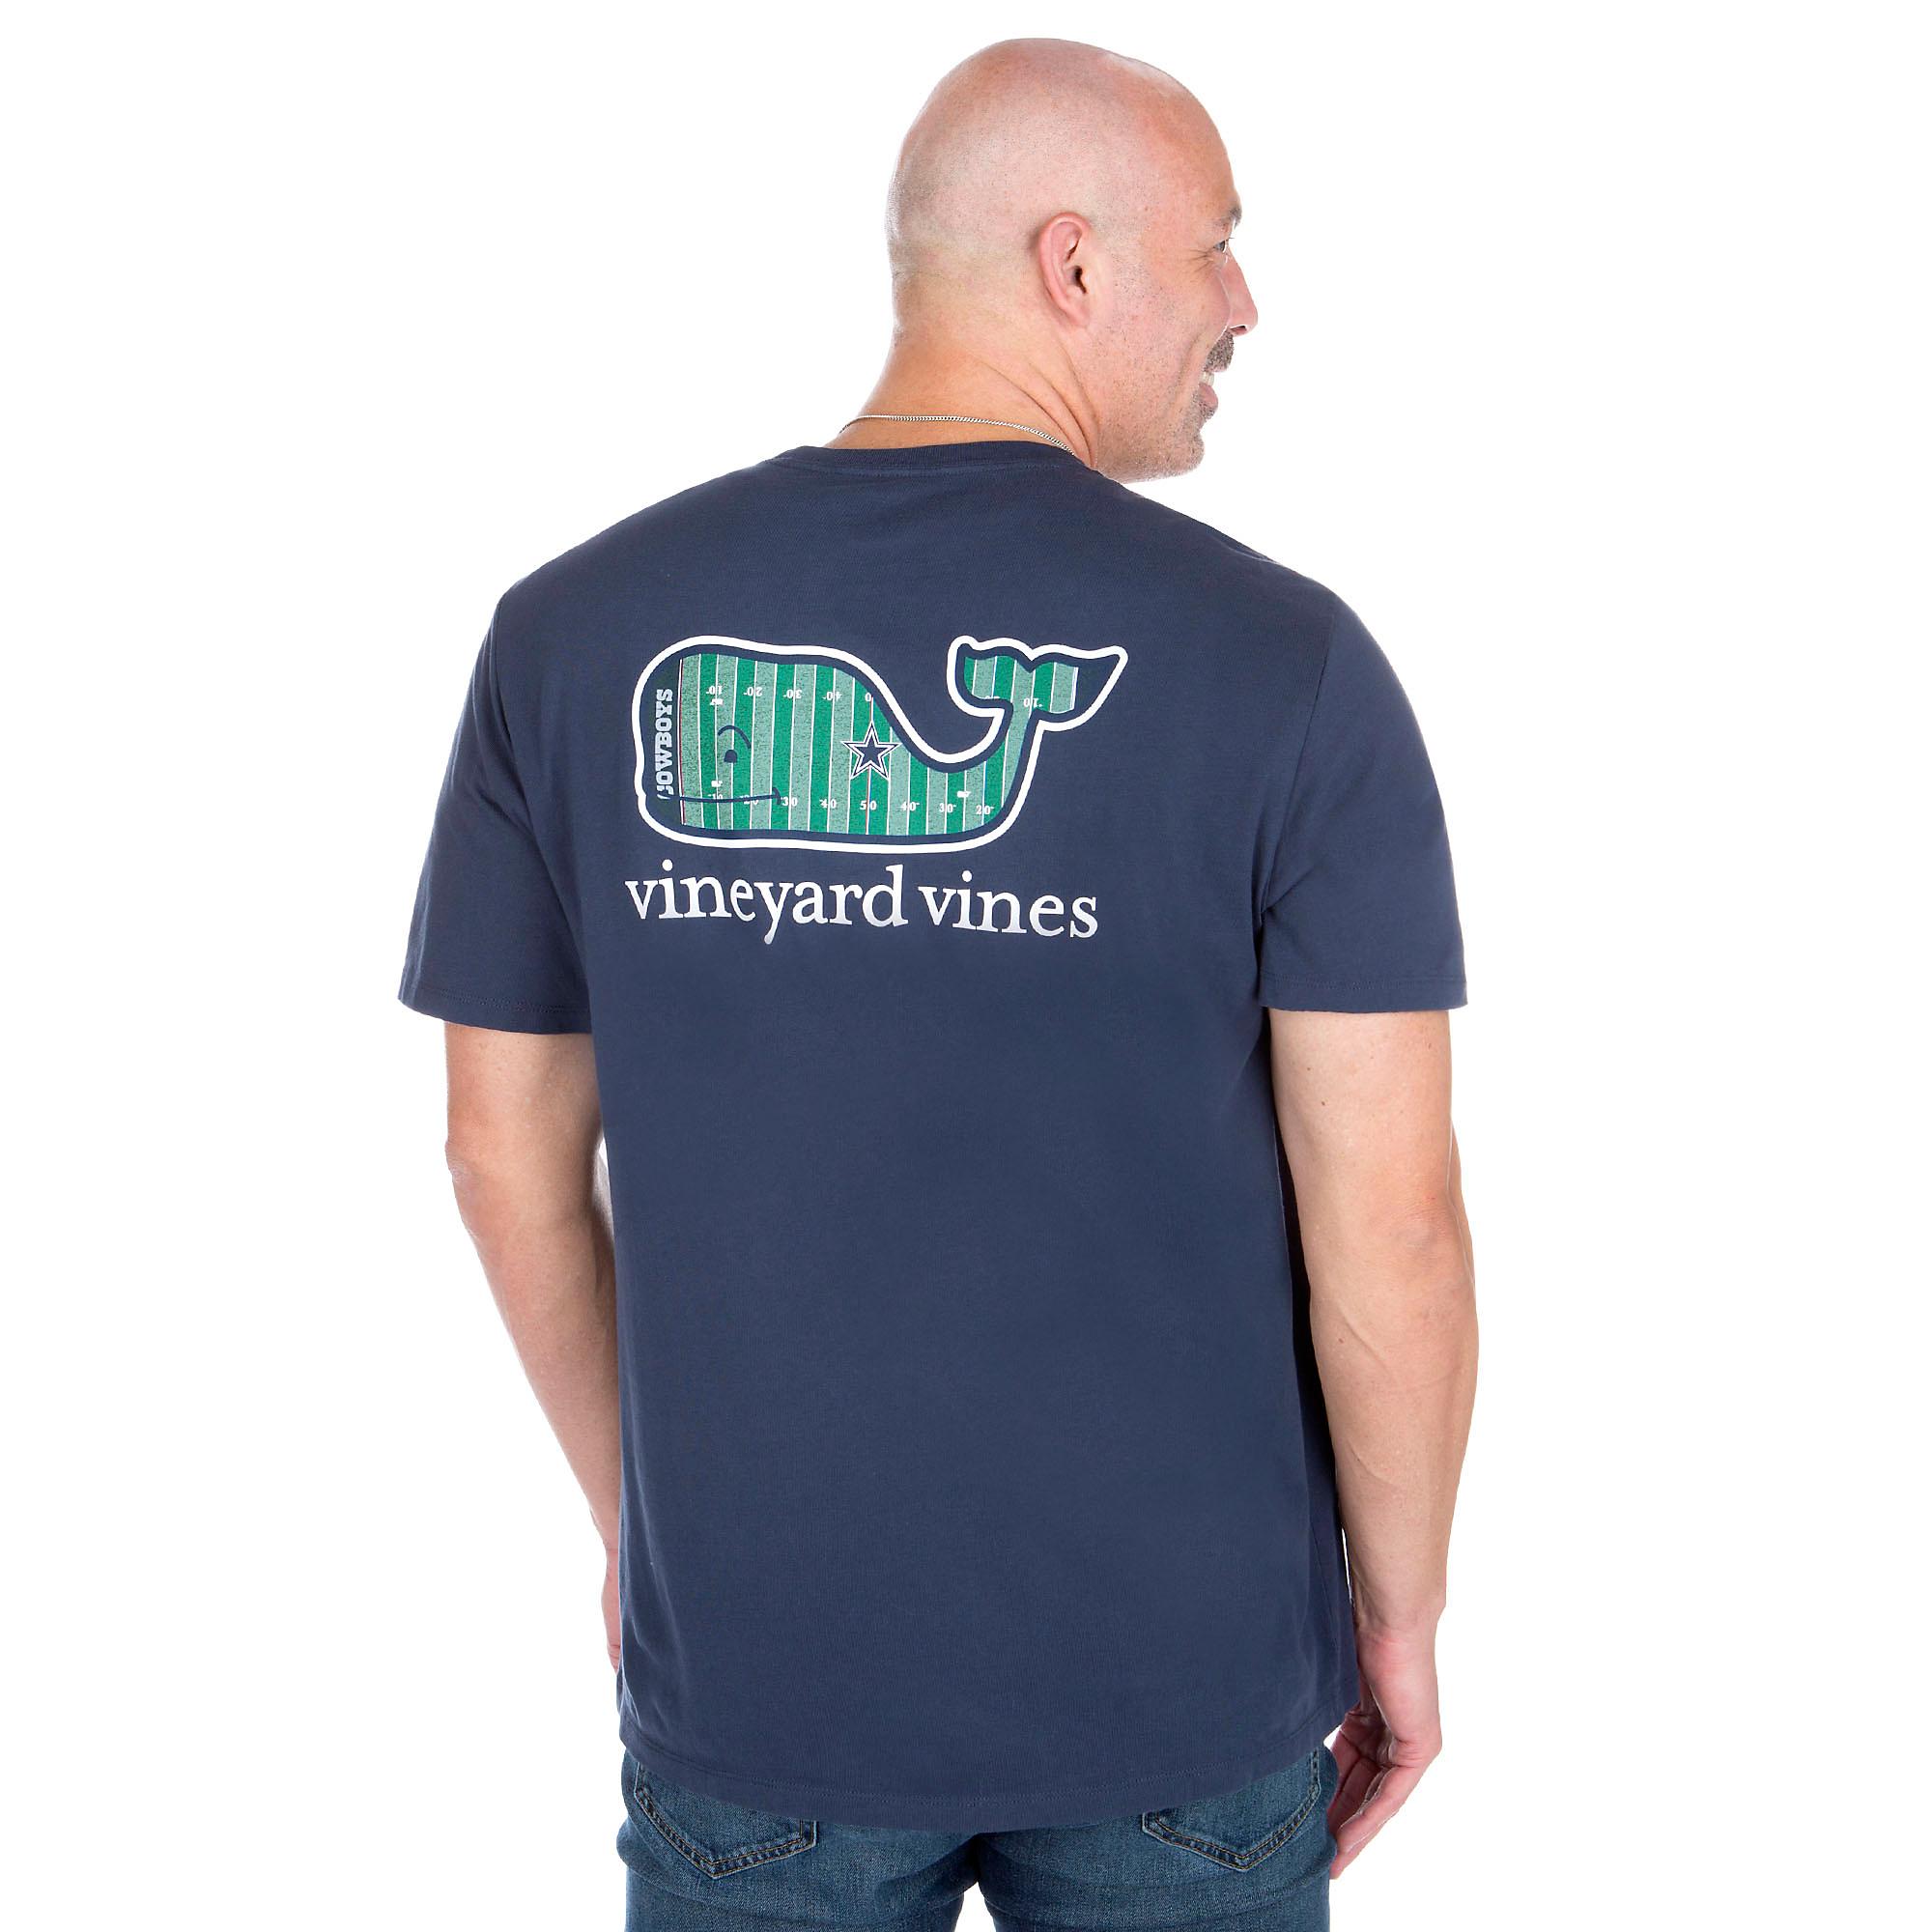 03d219dc7 Dallas Cowboys Vineyard Vines Yardline Whale Short Sleeve Tee